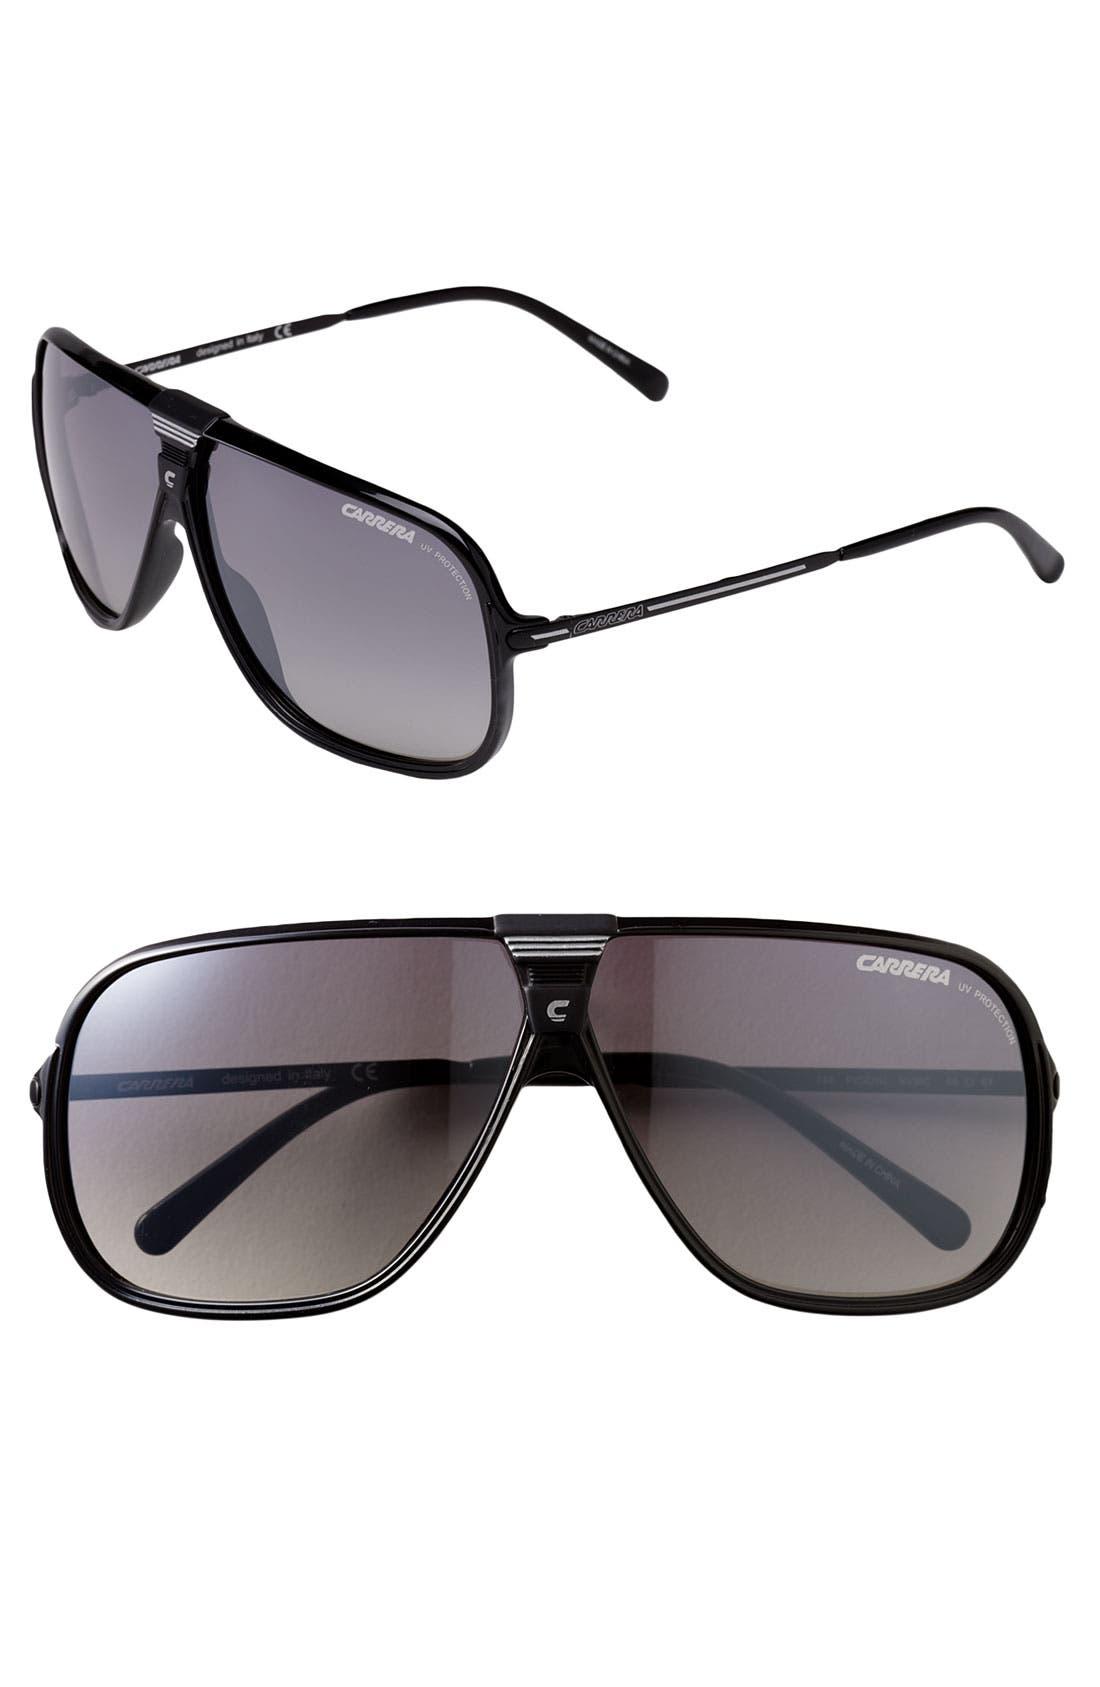 Main Image - Carrera Eyewear 'Picchu' Aviator Sunglasses